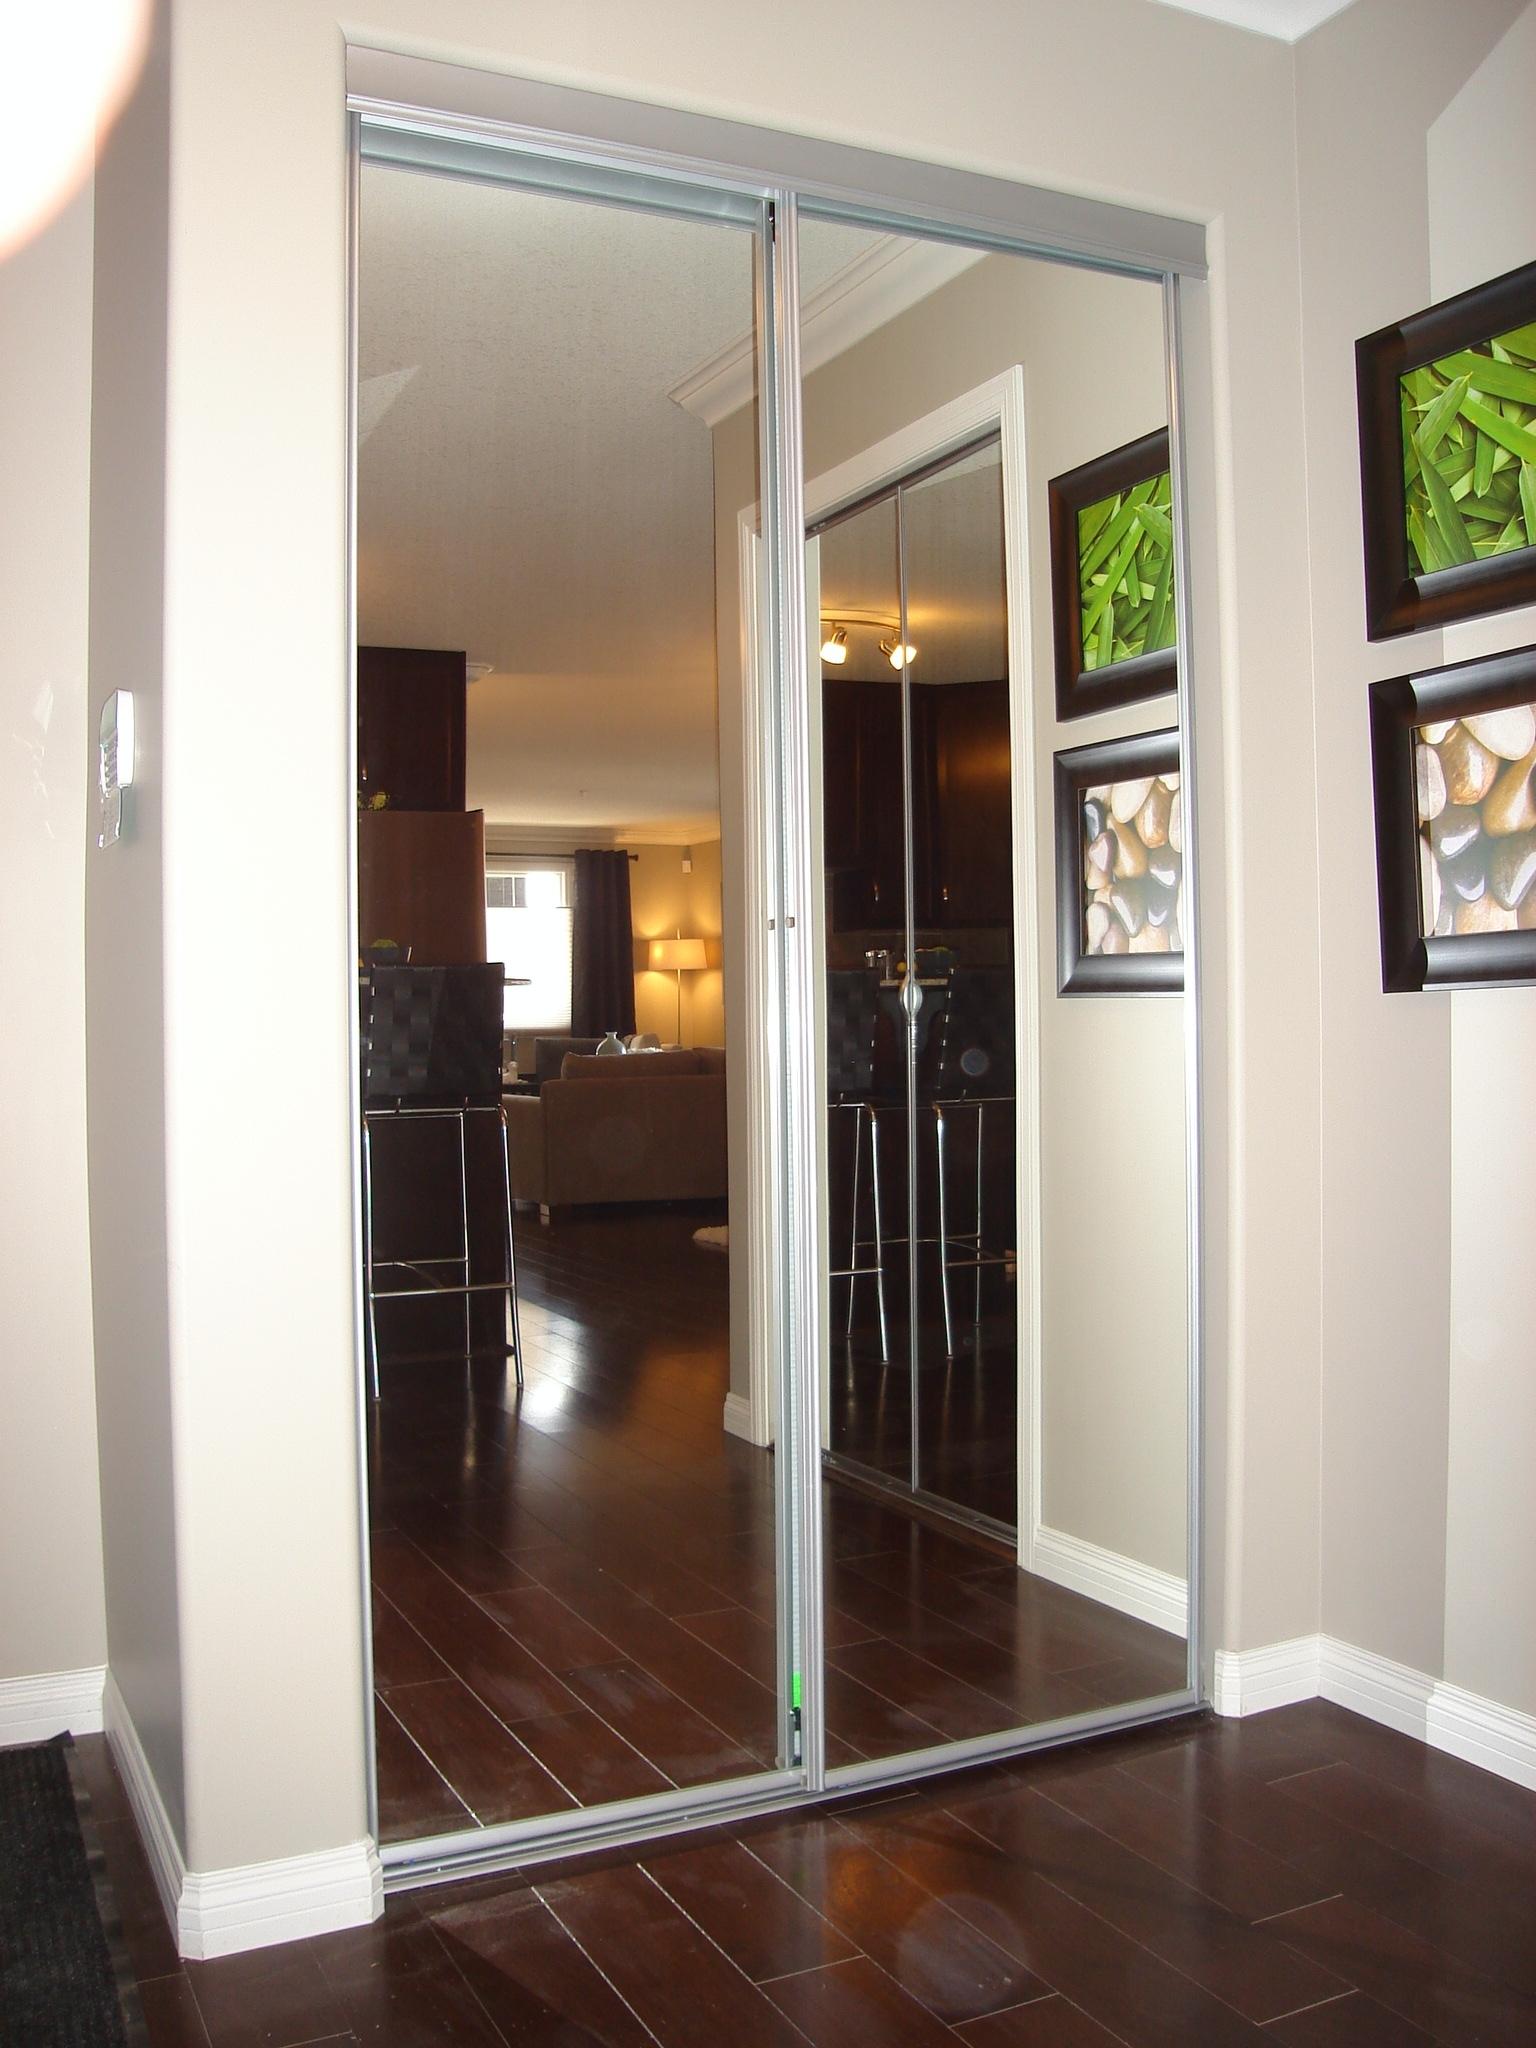 Sliding Closet Doors Without Mirrorssliding closet doors without mirrors sliding doors design